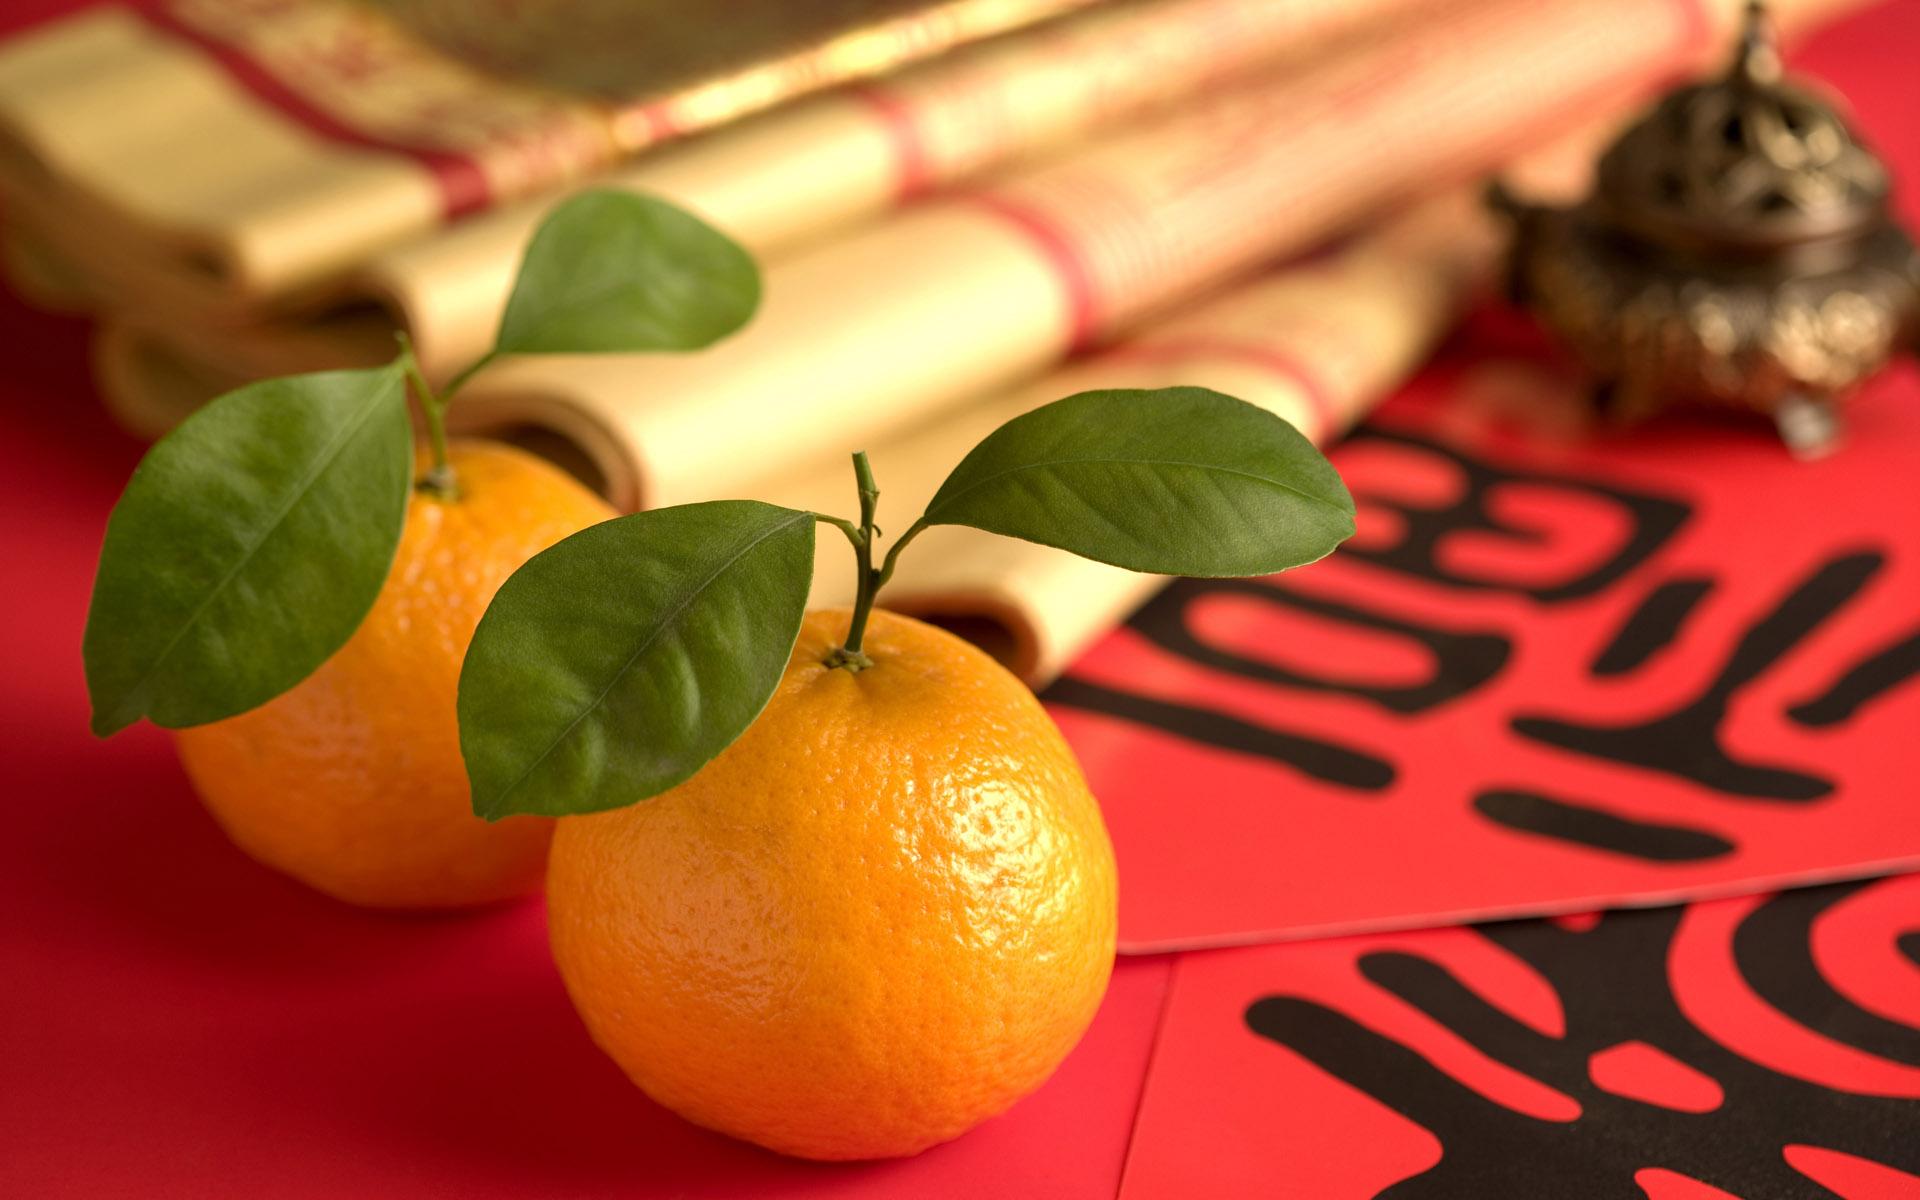 мандарин веер шар без смс